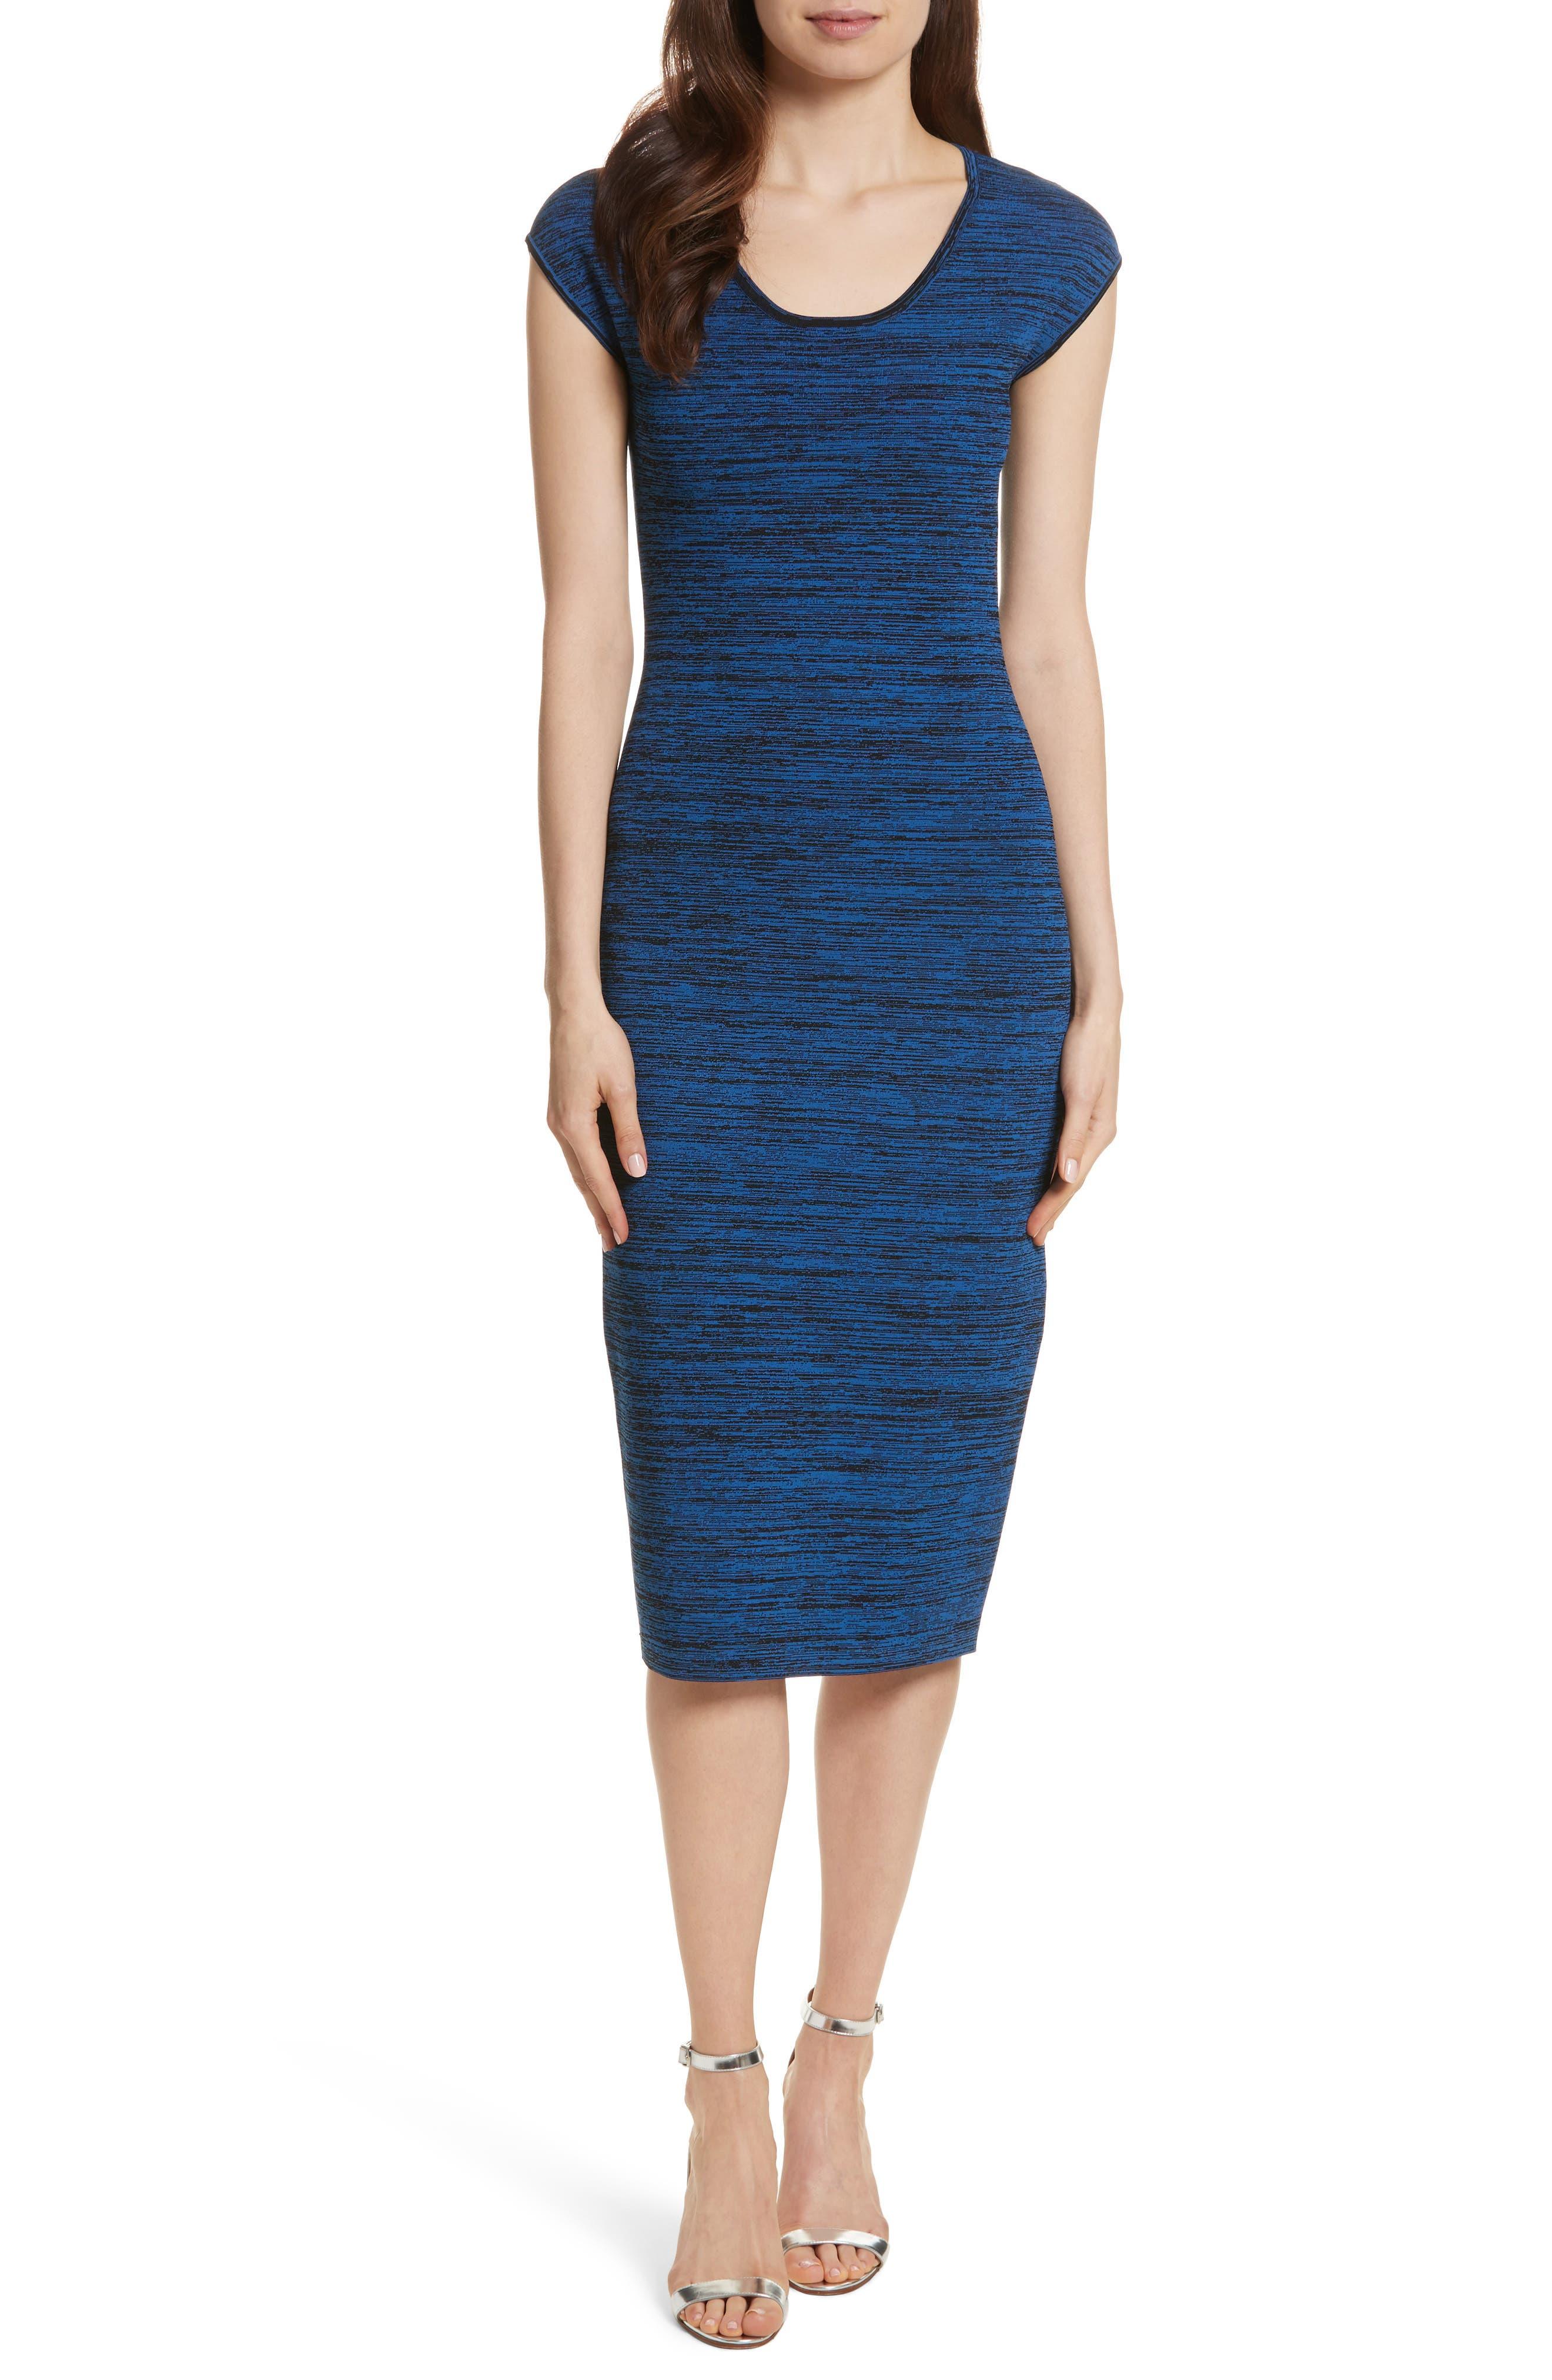 Diane von Furstenberg Sweater Dress,                             Main thumbnail 1, color,                             429